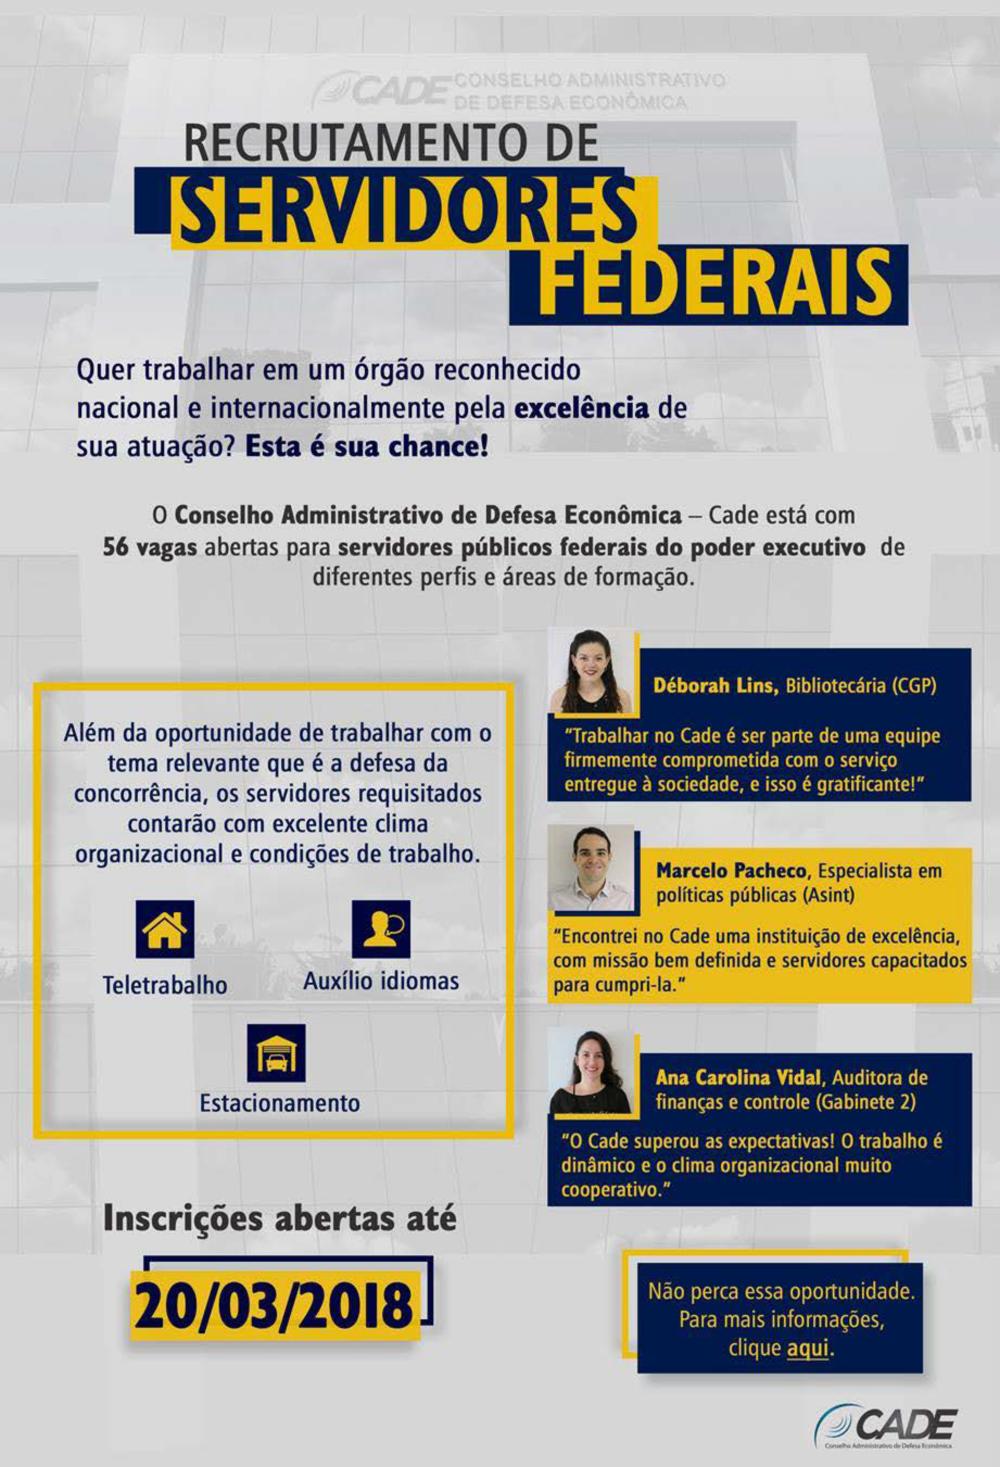 Anexo_0449570_Recrutamento_2018.png